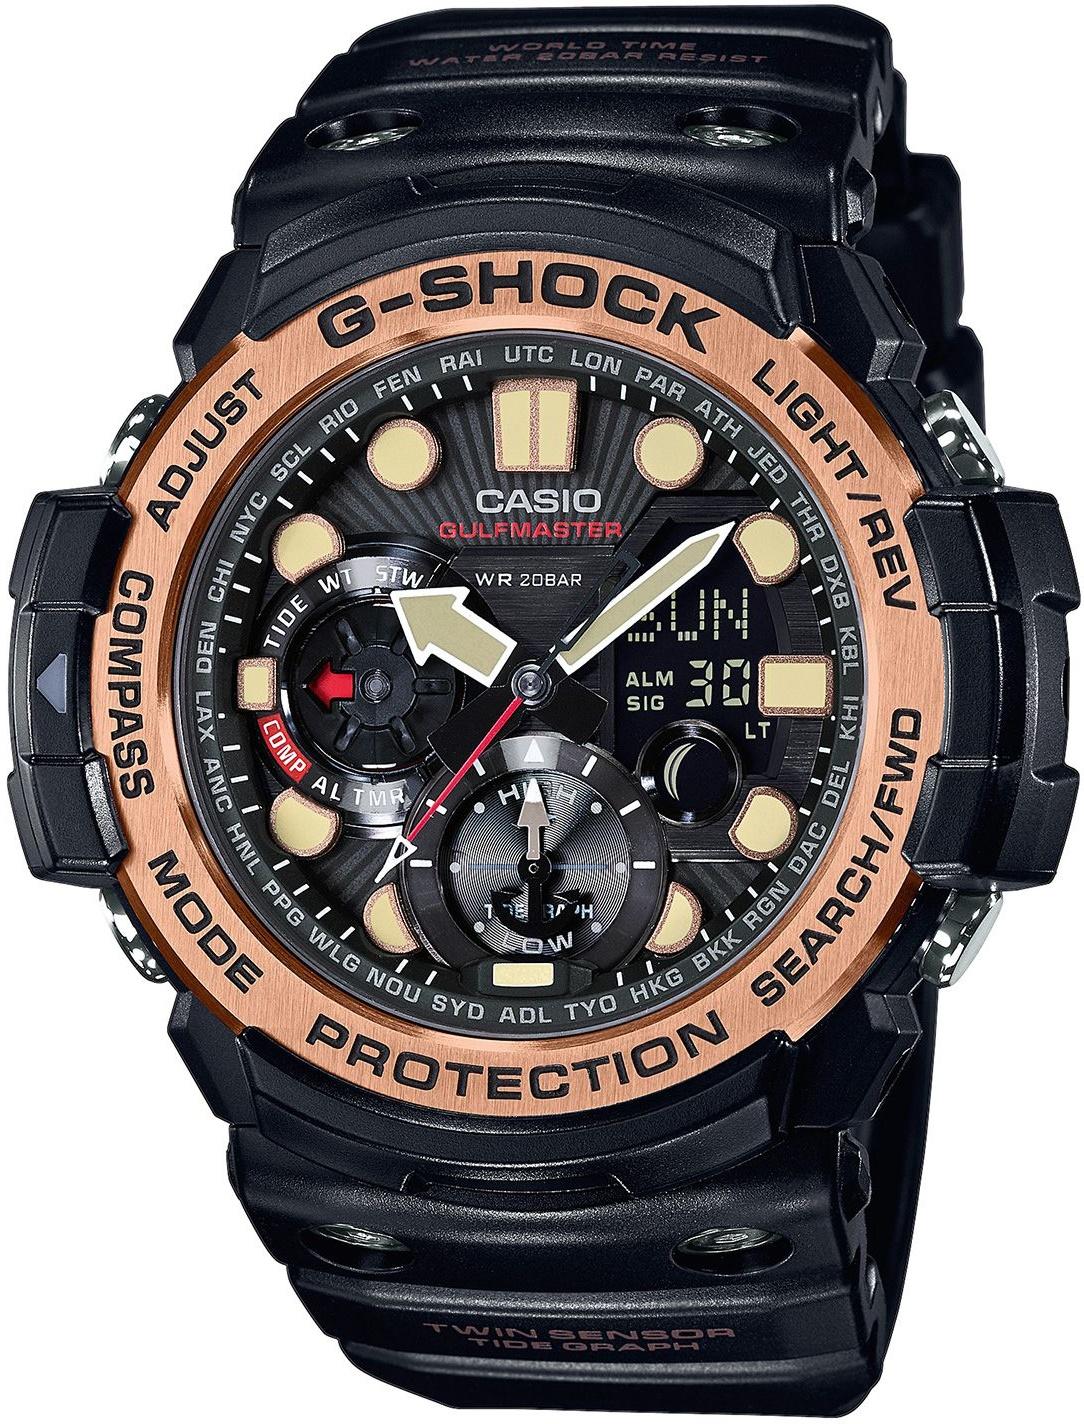 Мужские часы Casio G-Shock GN-1000RG-1AER